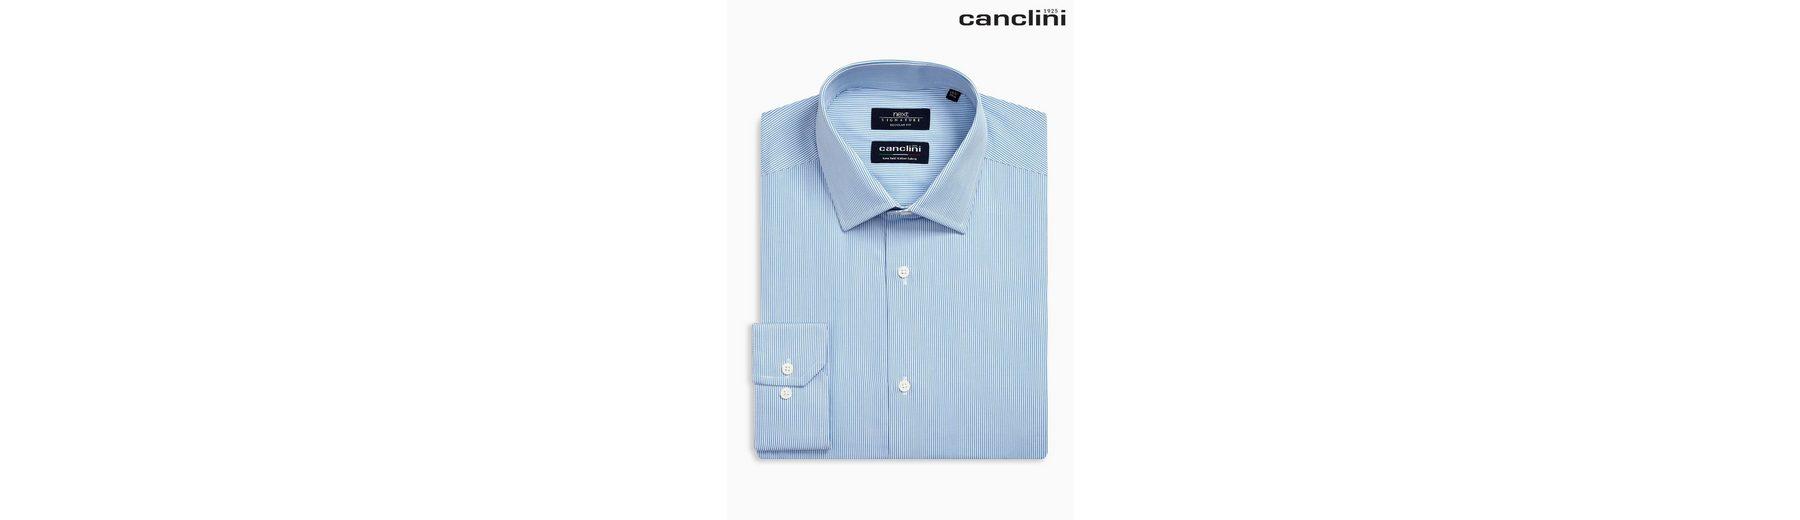 Next Canclini-Hemd